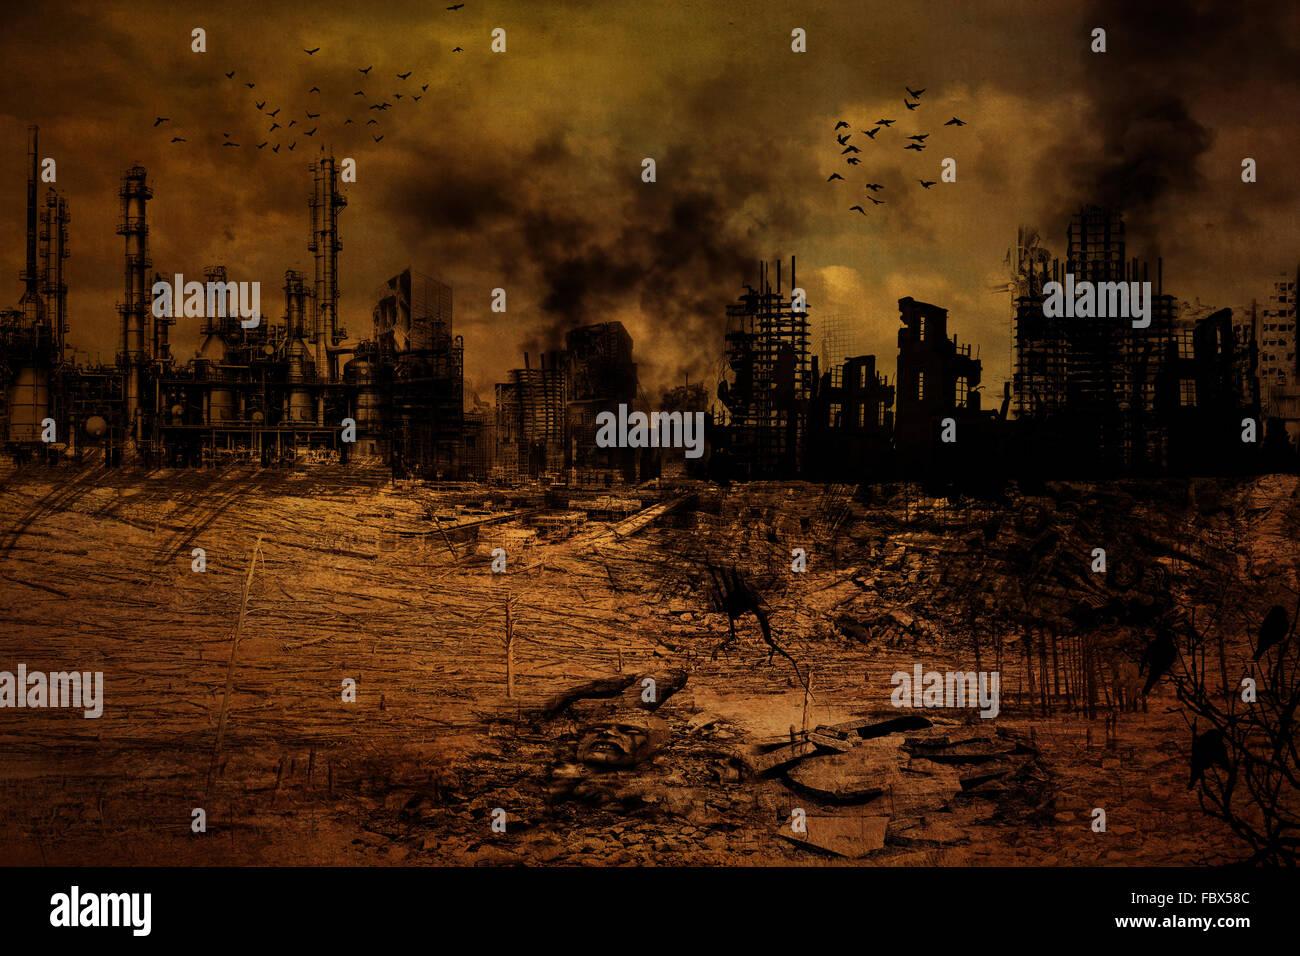 Background - Destroyed City - Stock Image